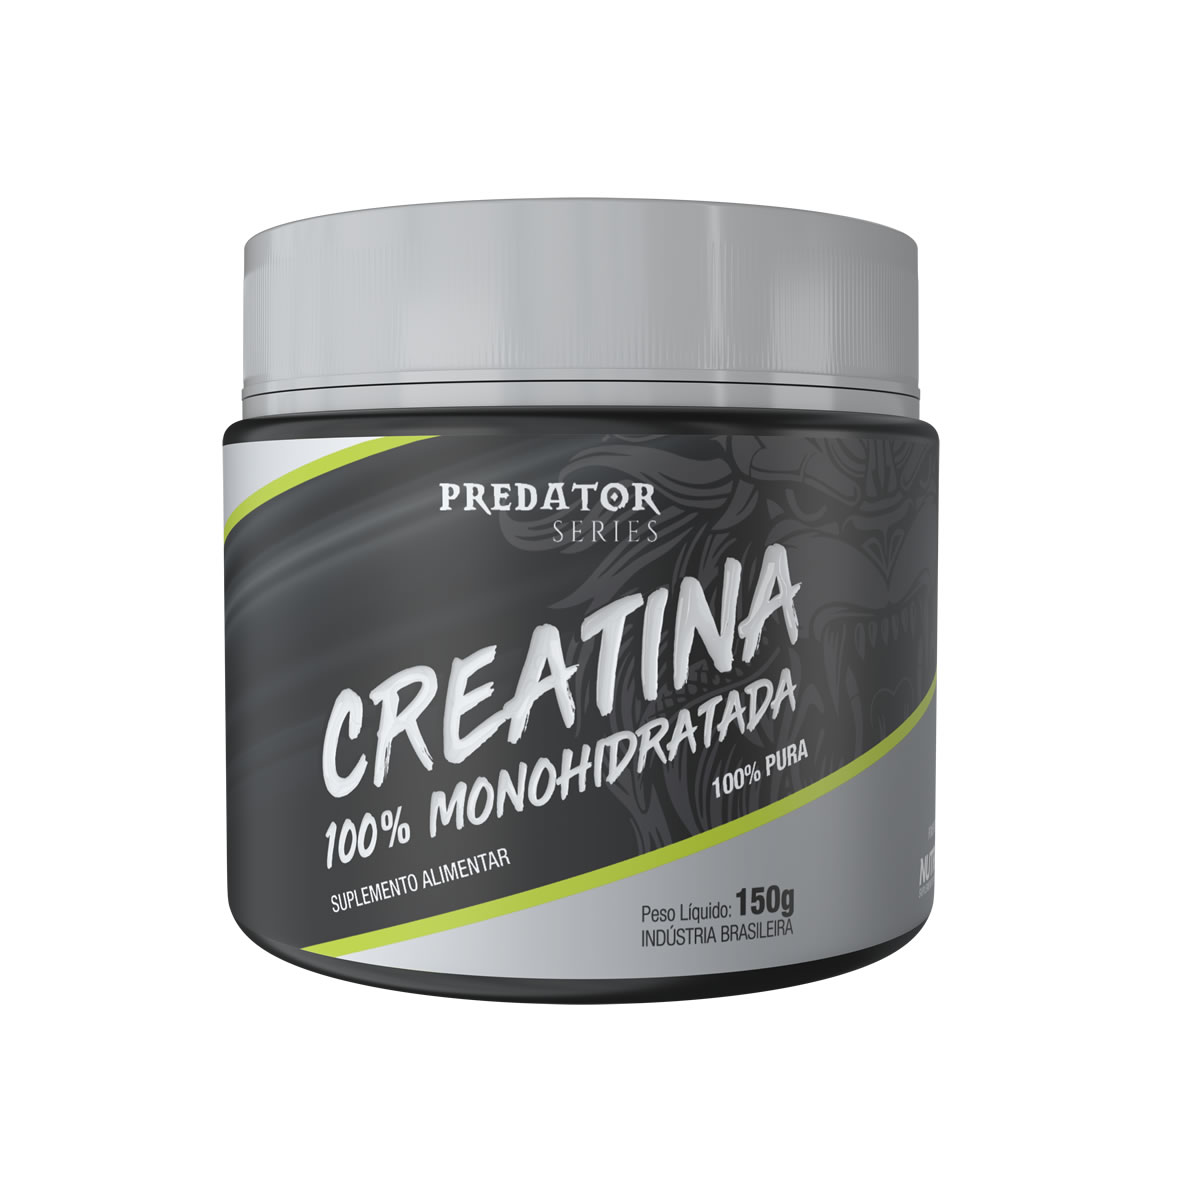 Creatina 100% Monohidratada 150g - Nutrata